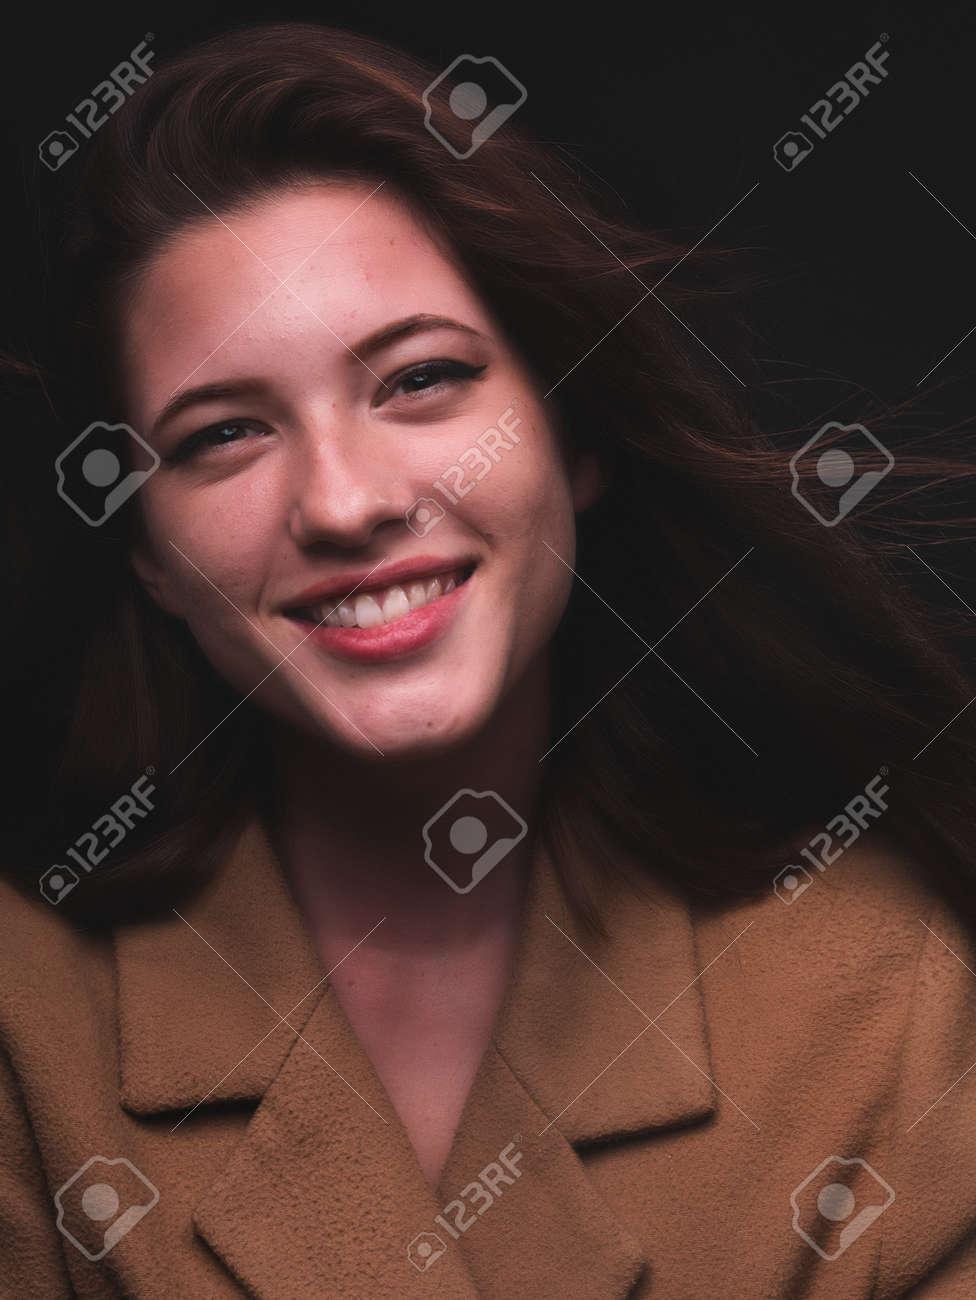 high key. Conceptual portrait with plastic sheets. One young woman strugling with plastic sheets. - 164118905